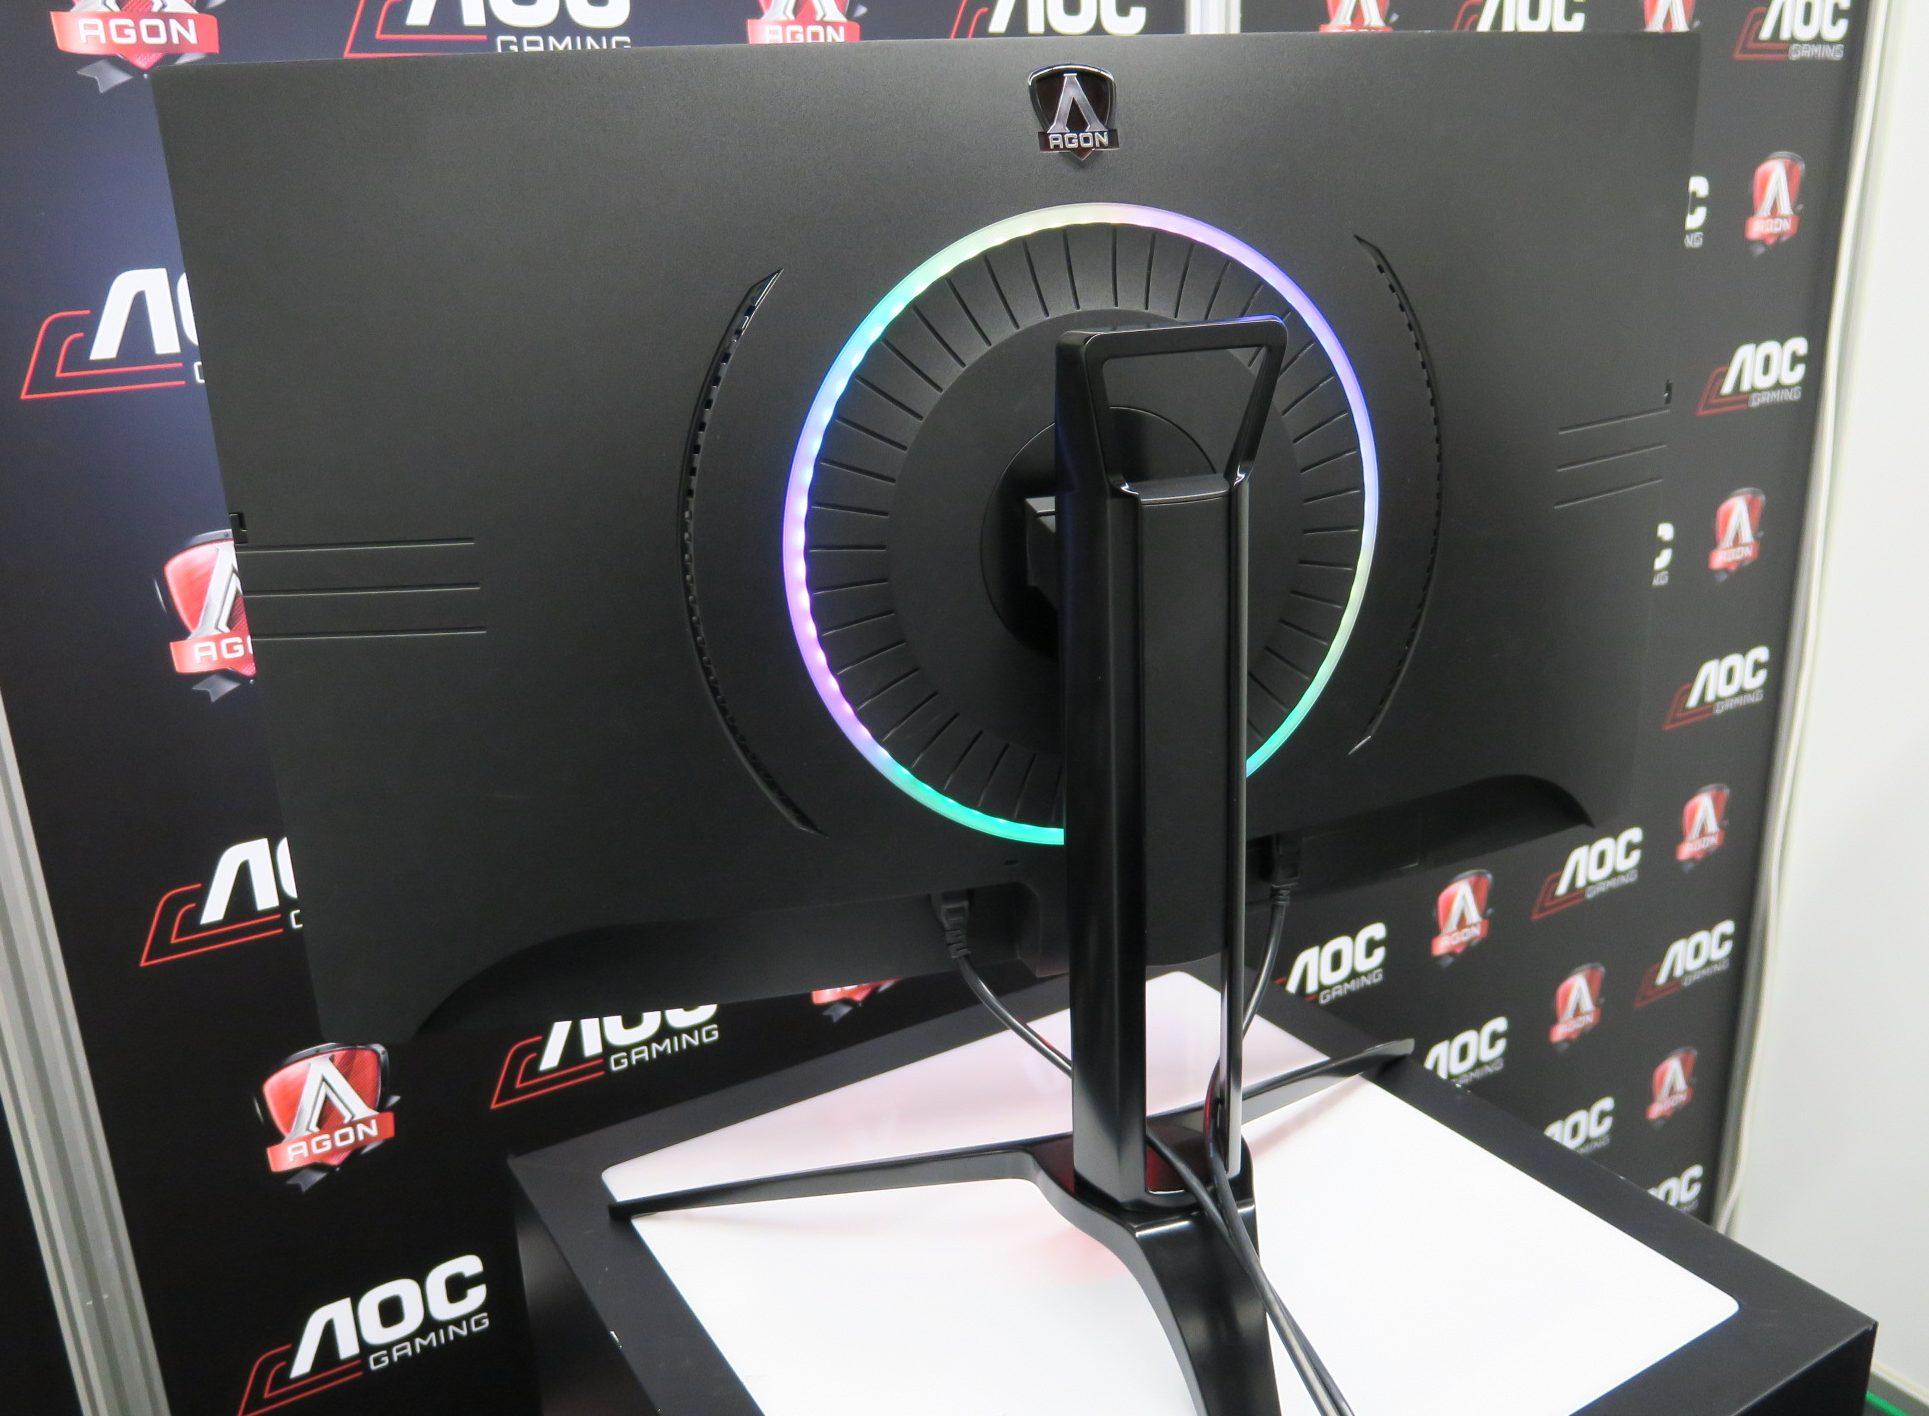 AOC Gaming Monitore Gamescom 2017 GC Text